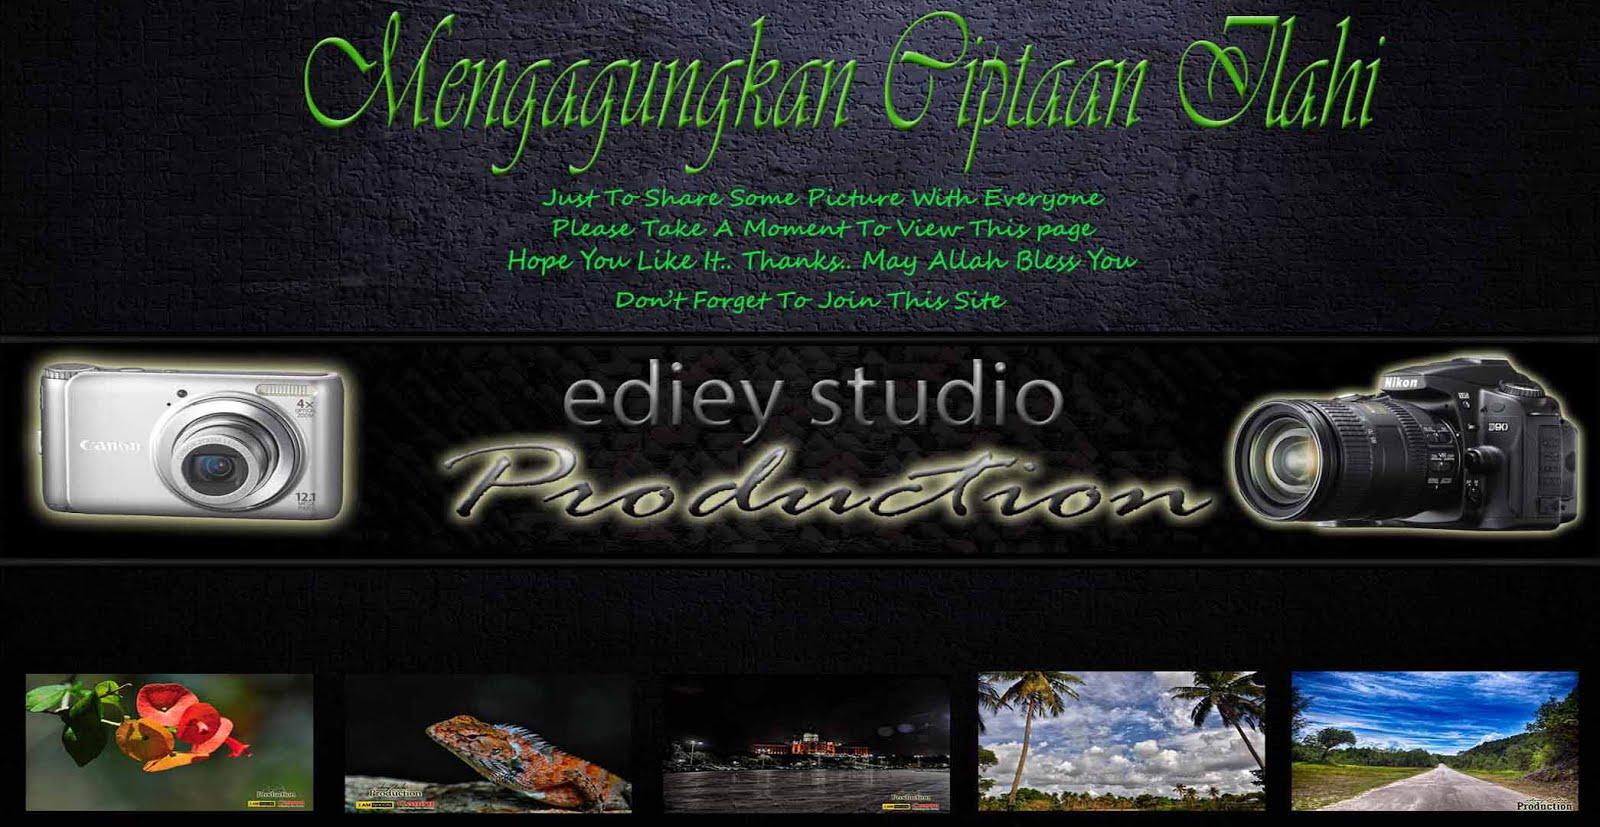 ediey studio production